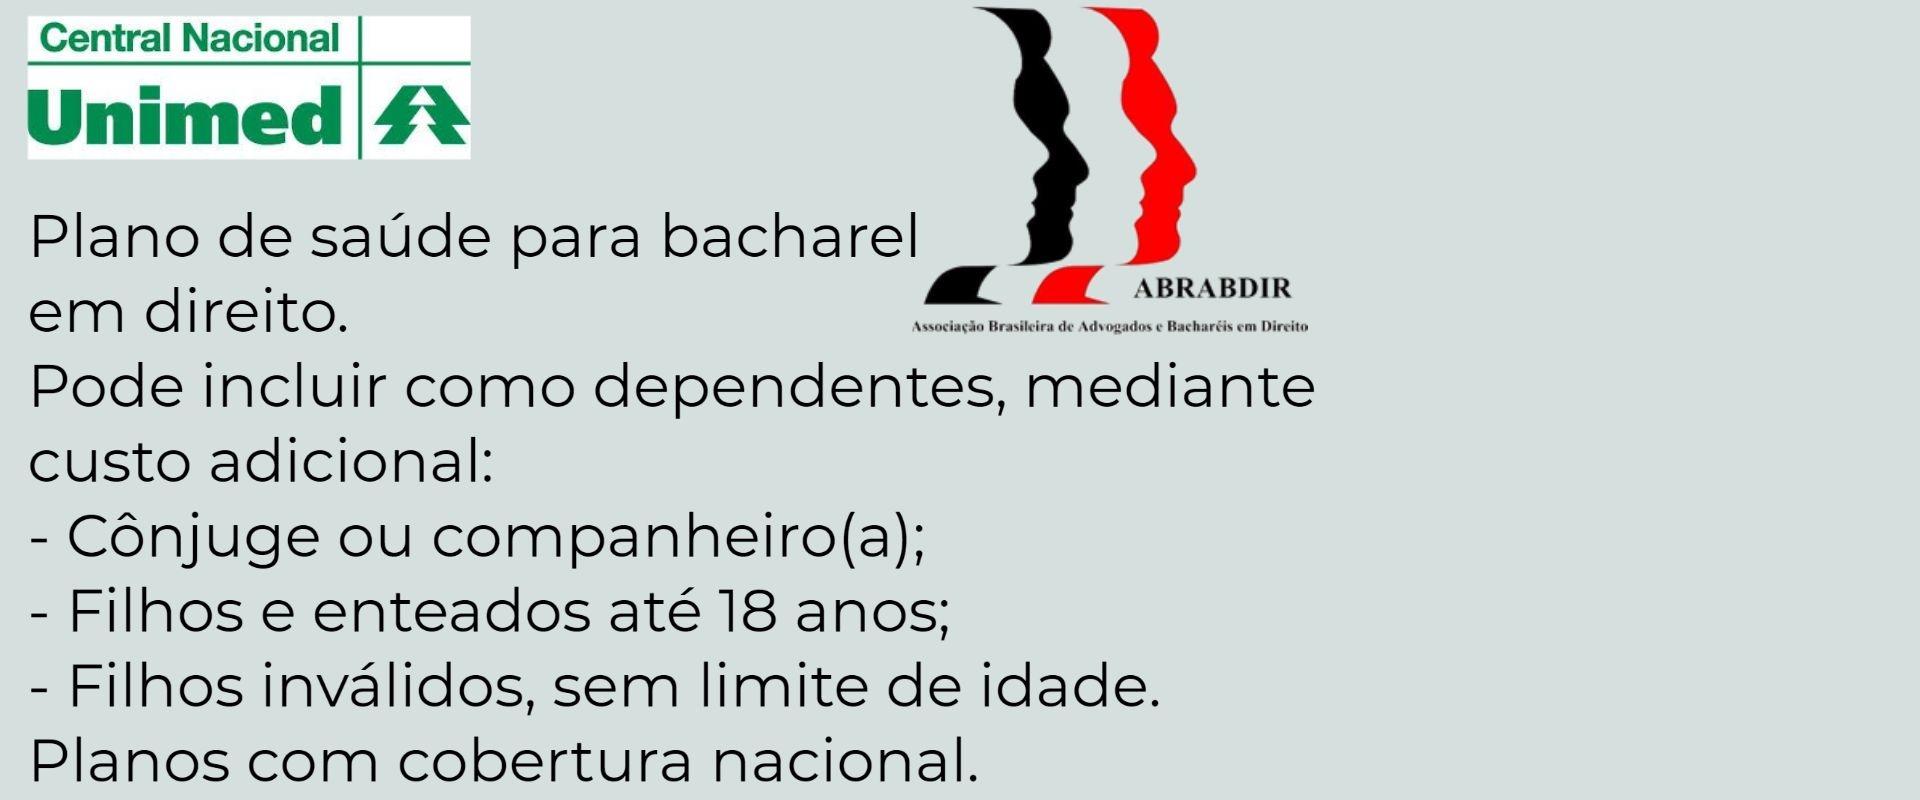 Unimed ABRABDIR Taubaté